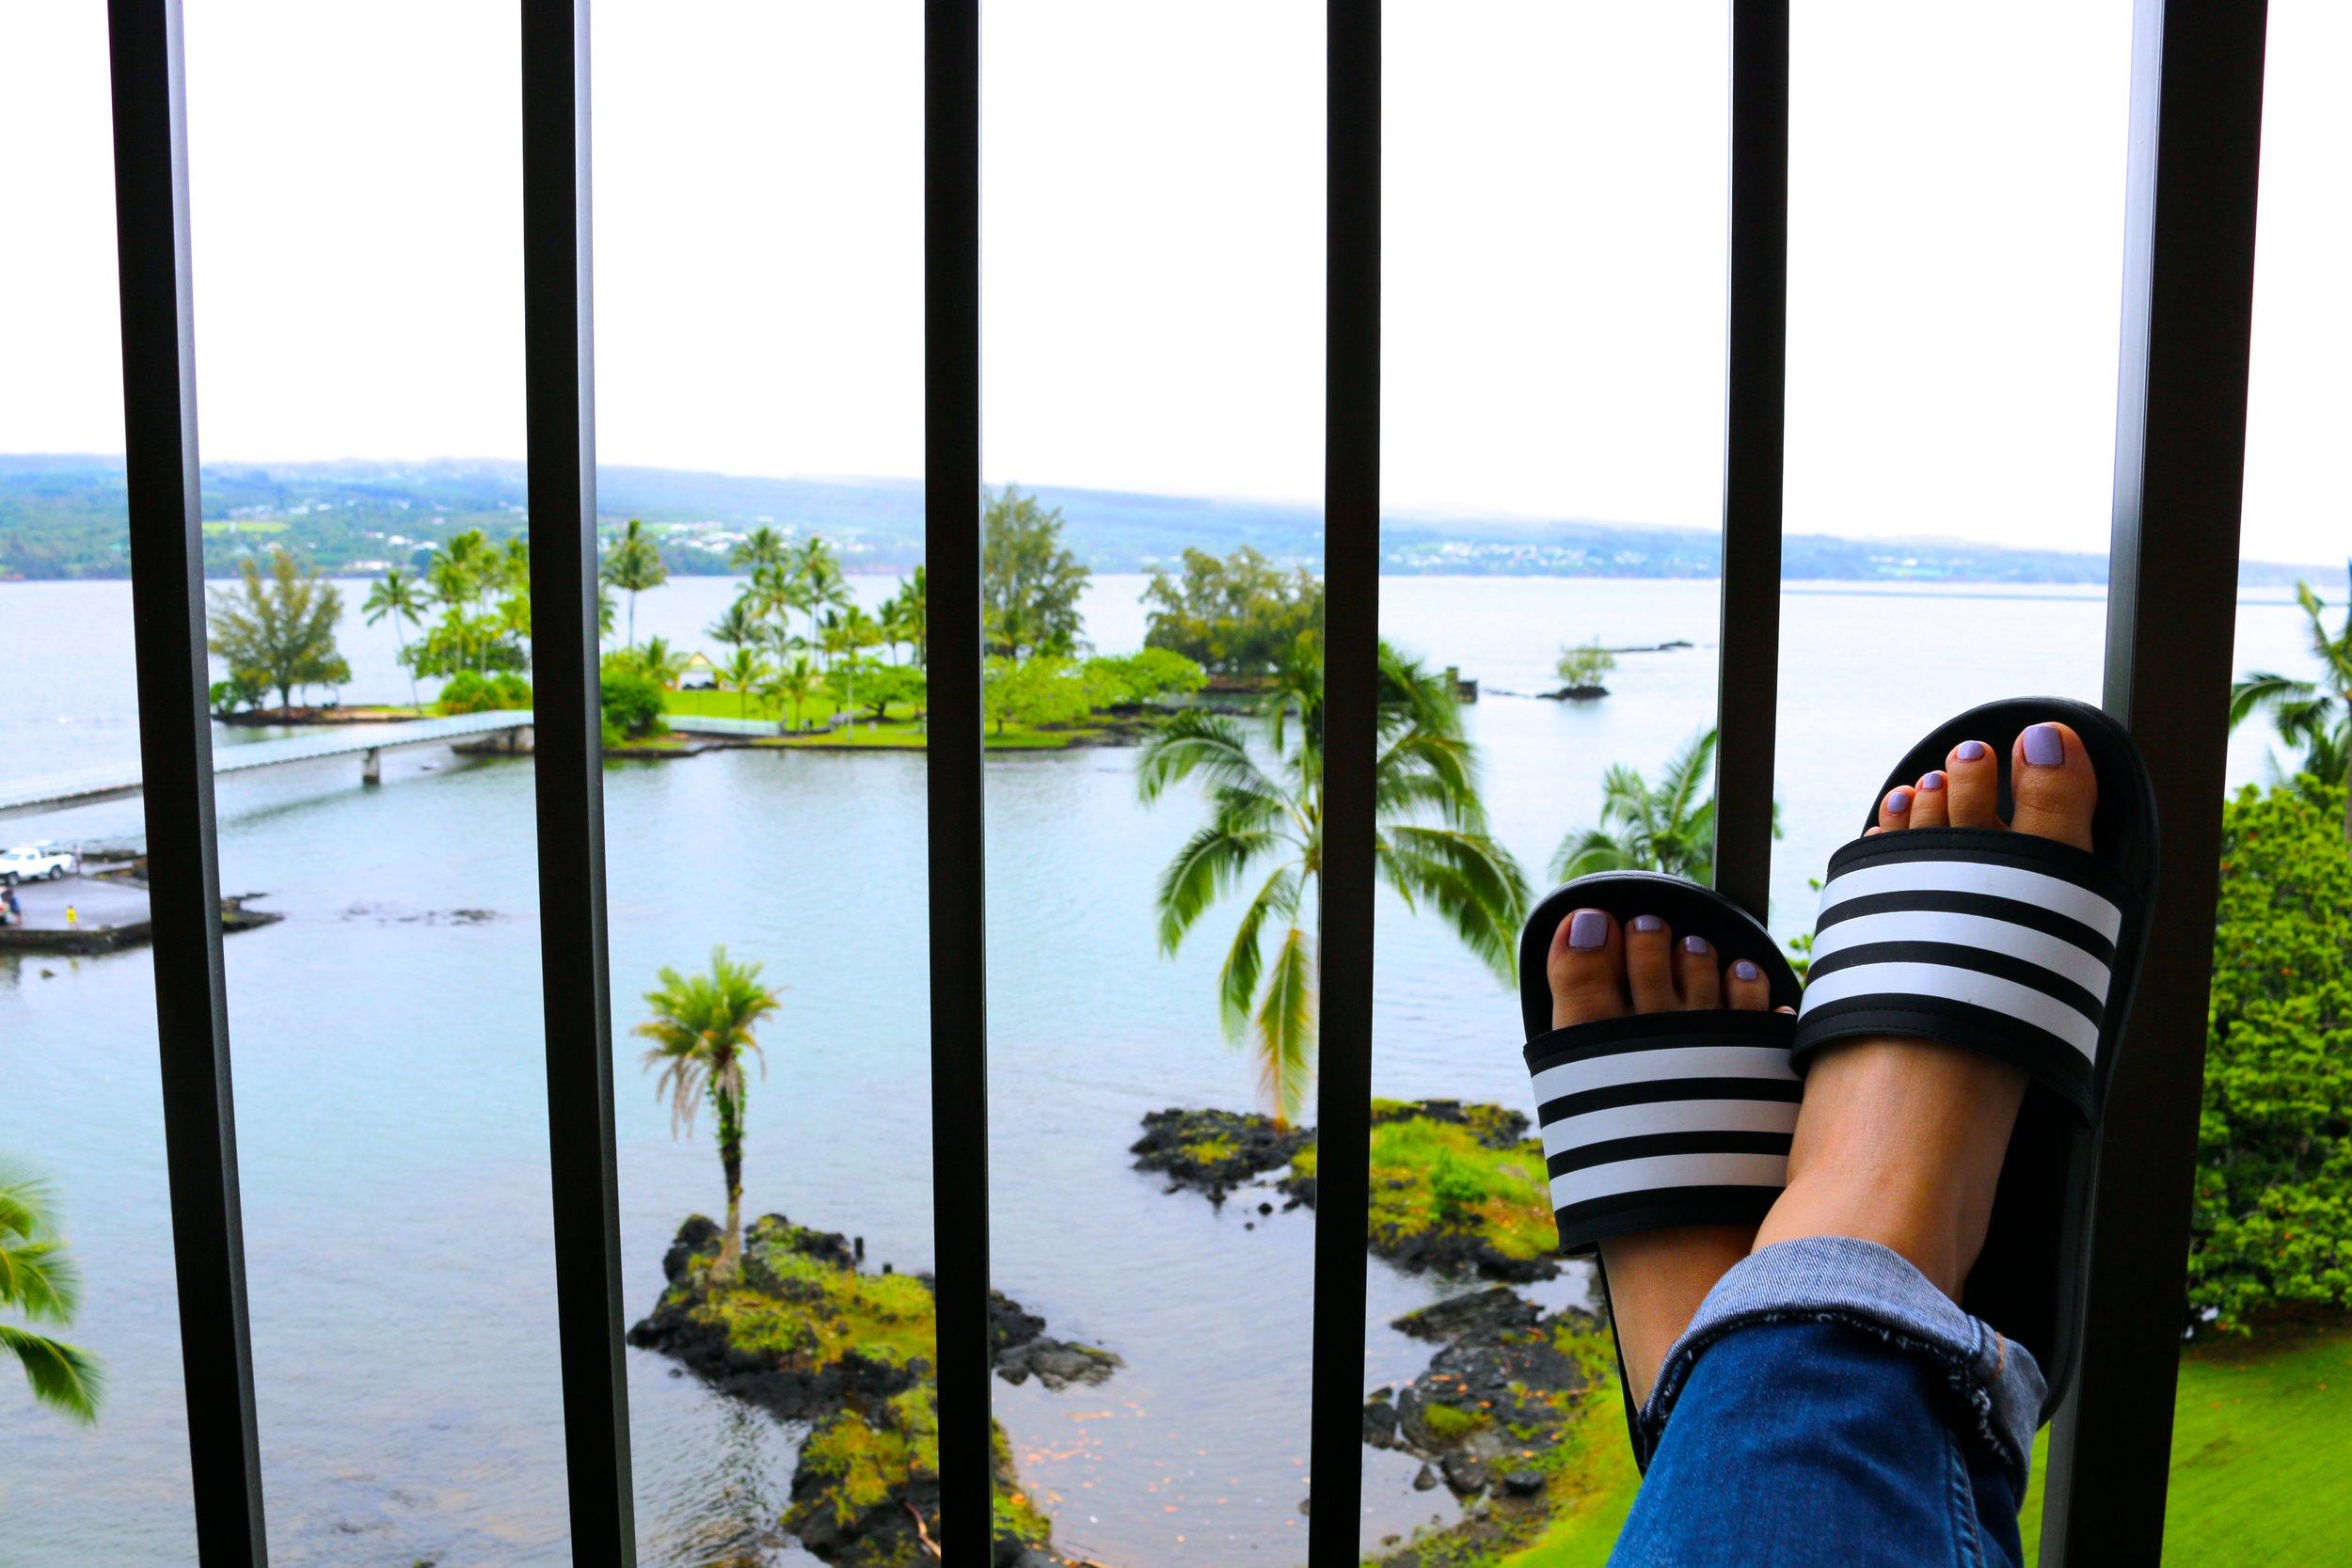 VIEWS OF COCONUT ISLAND/THE PACIFIC OCEAN/MAUNAKEA FROM MY BALCONY AT  HILO HAWAIIAN HOTEL.